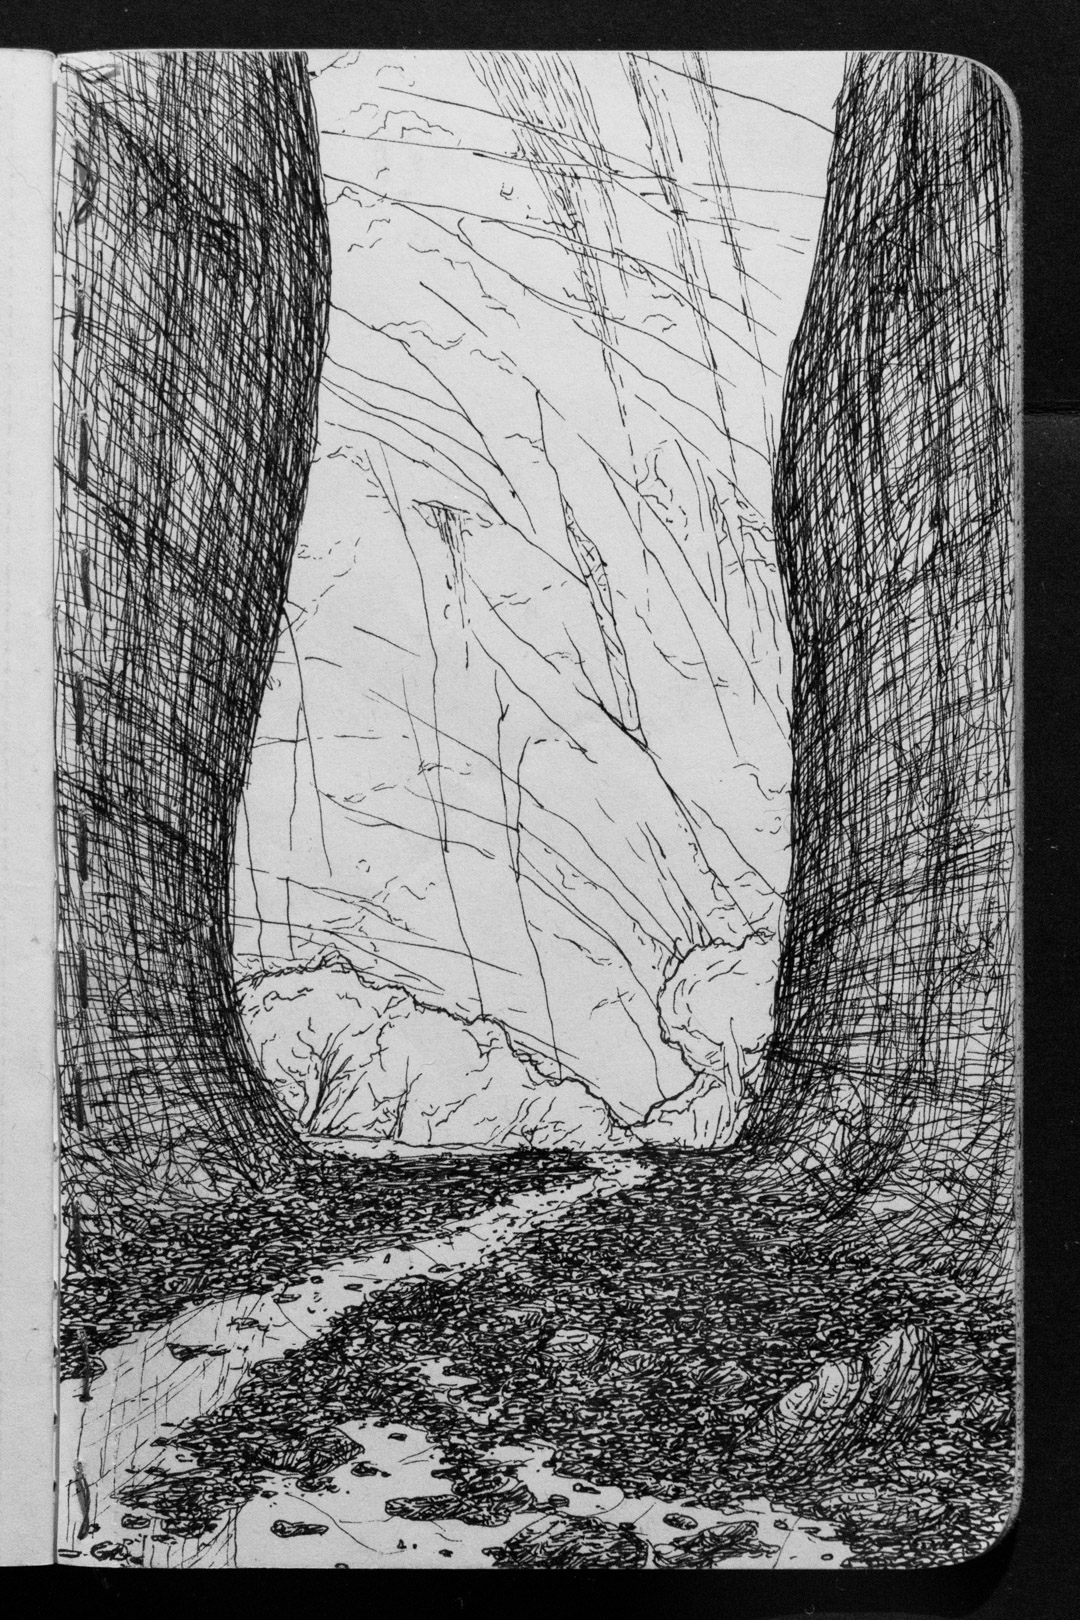 00-12 Halls Creek Narrows.jpg